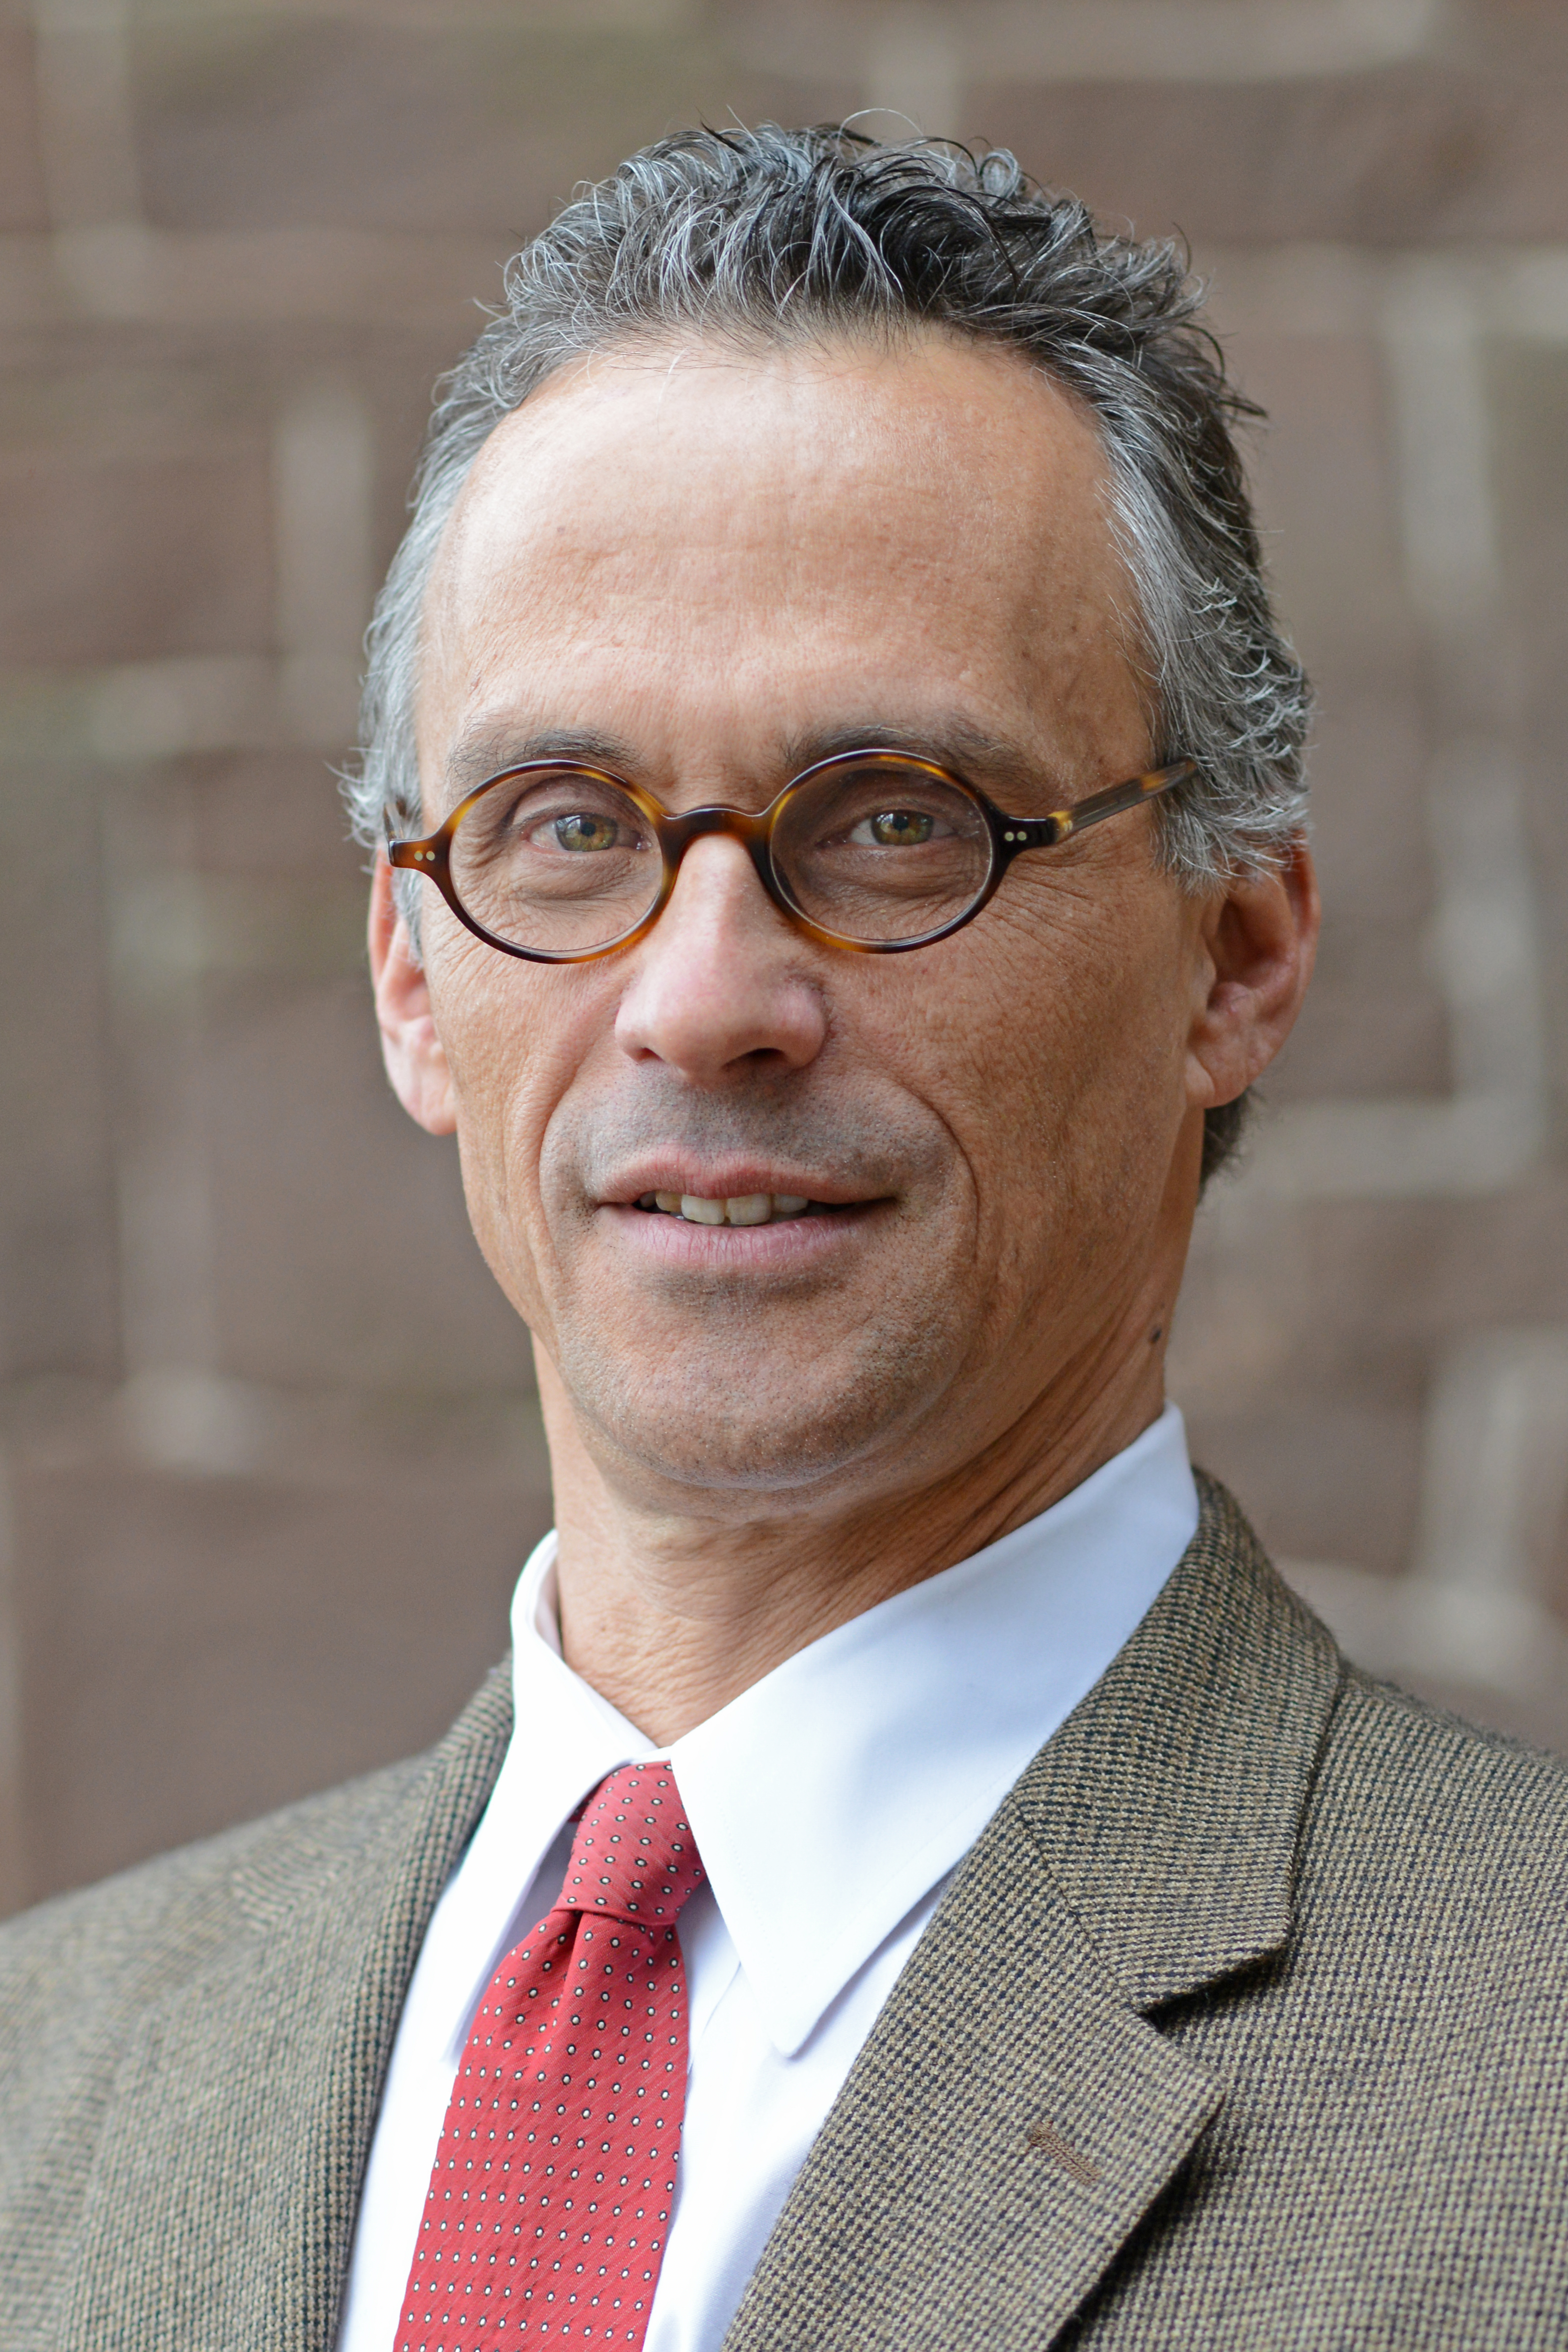 Wesleyan portrait of Michael S. Roth